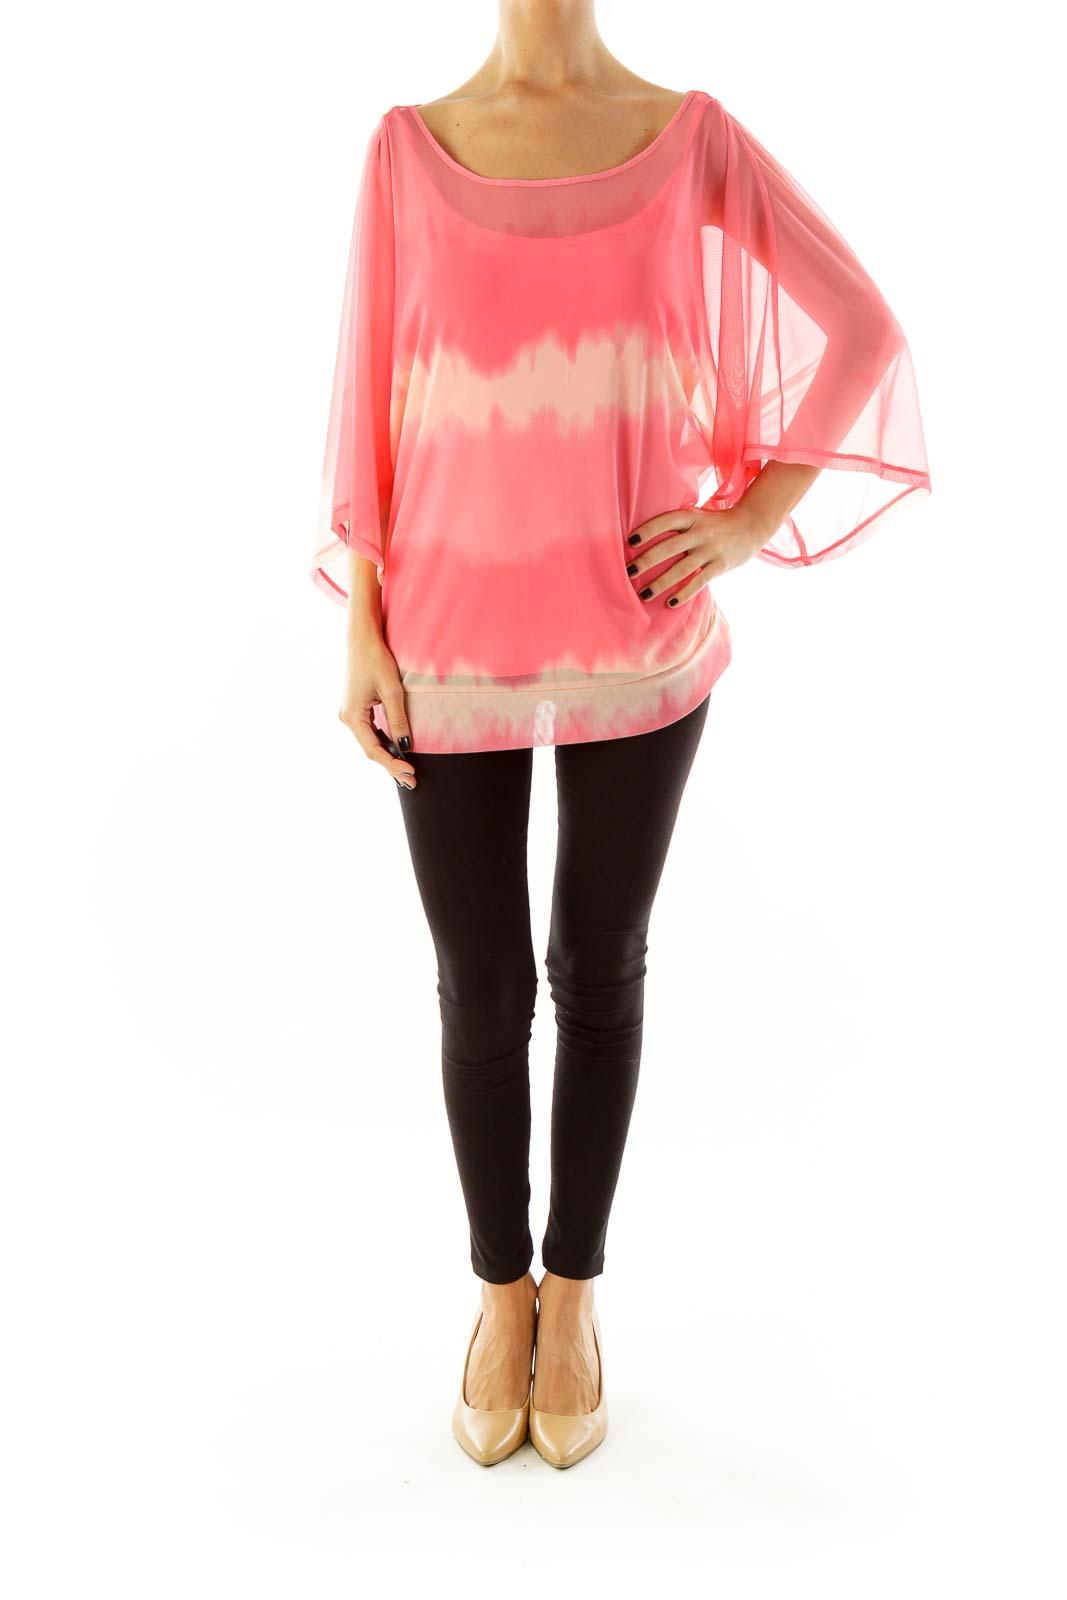 Pink & Beige Tie-Dye Print Blouse